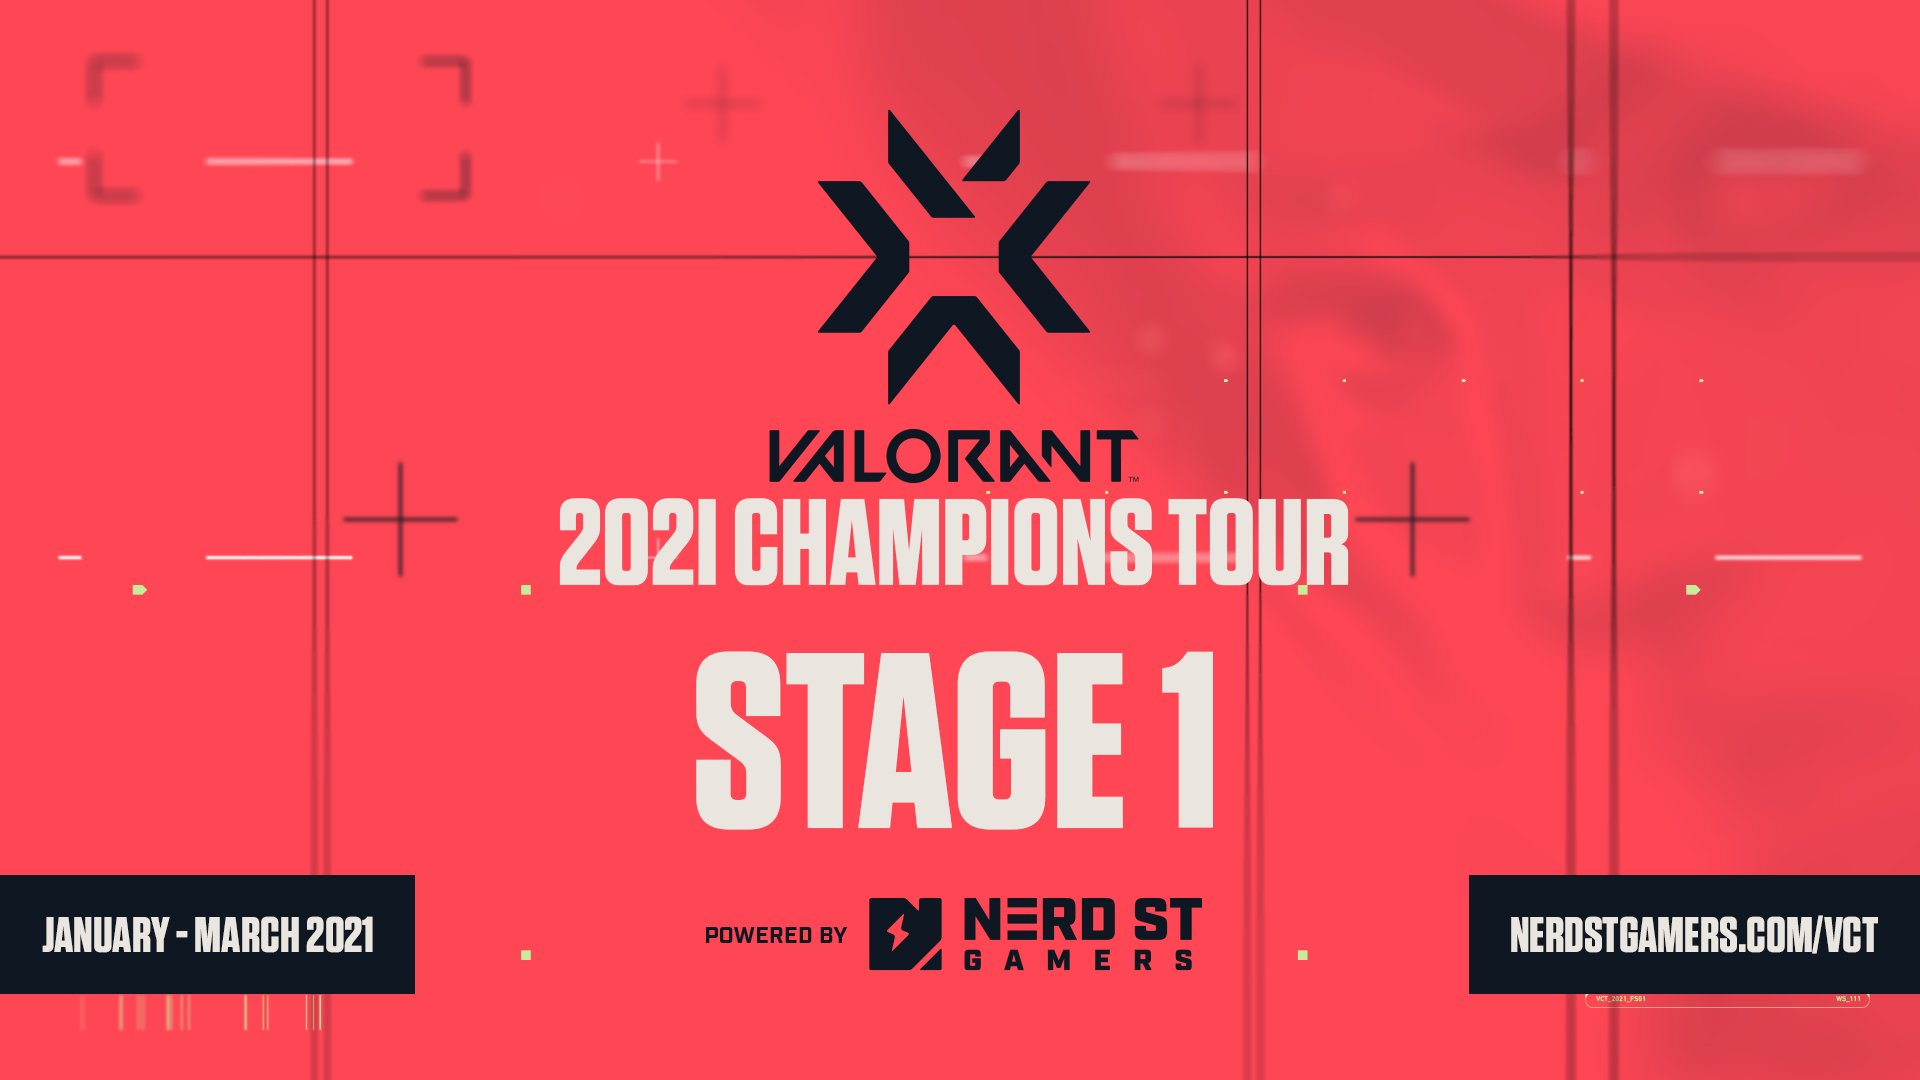 NSG Valorant champs 2021